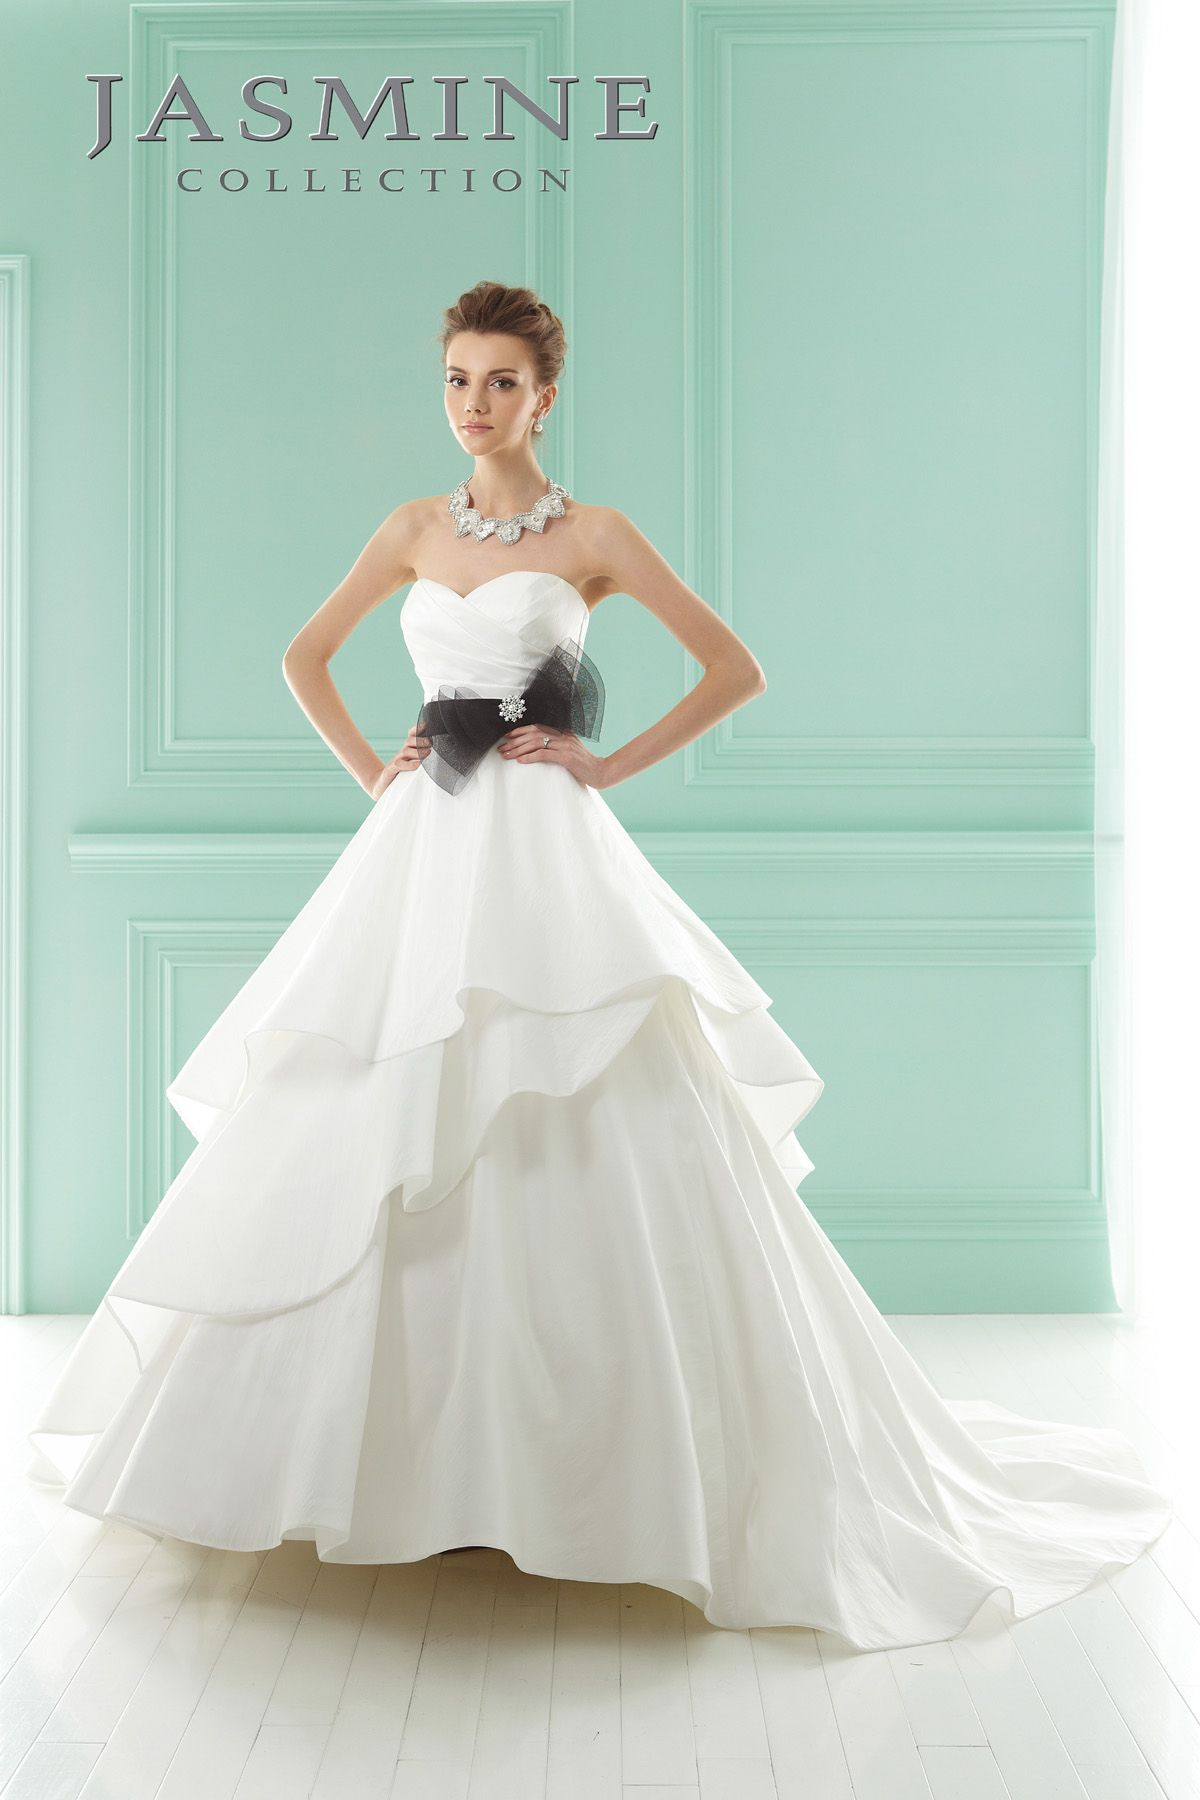 Other F141011 | Sarahnate\'s wedding :) | Pinterest | Jasmine bridal ...